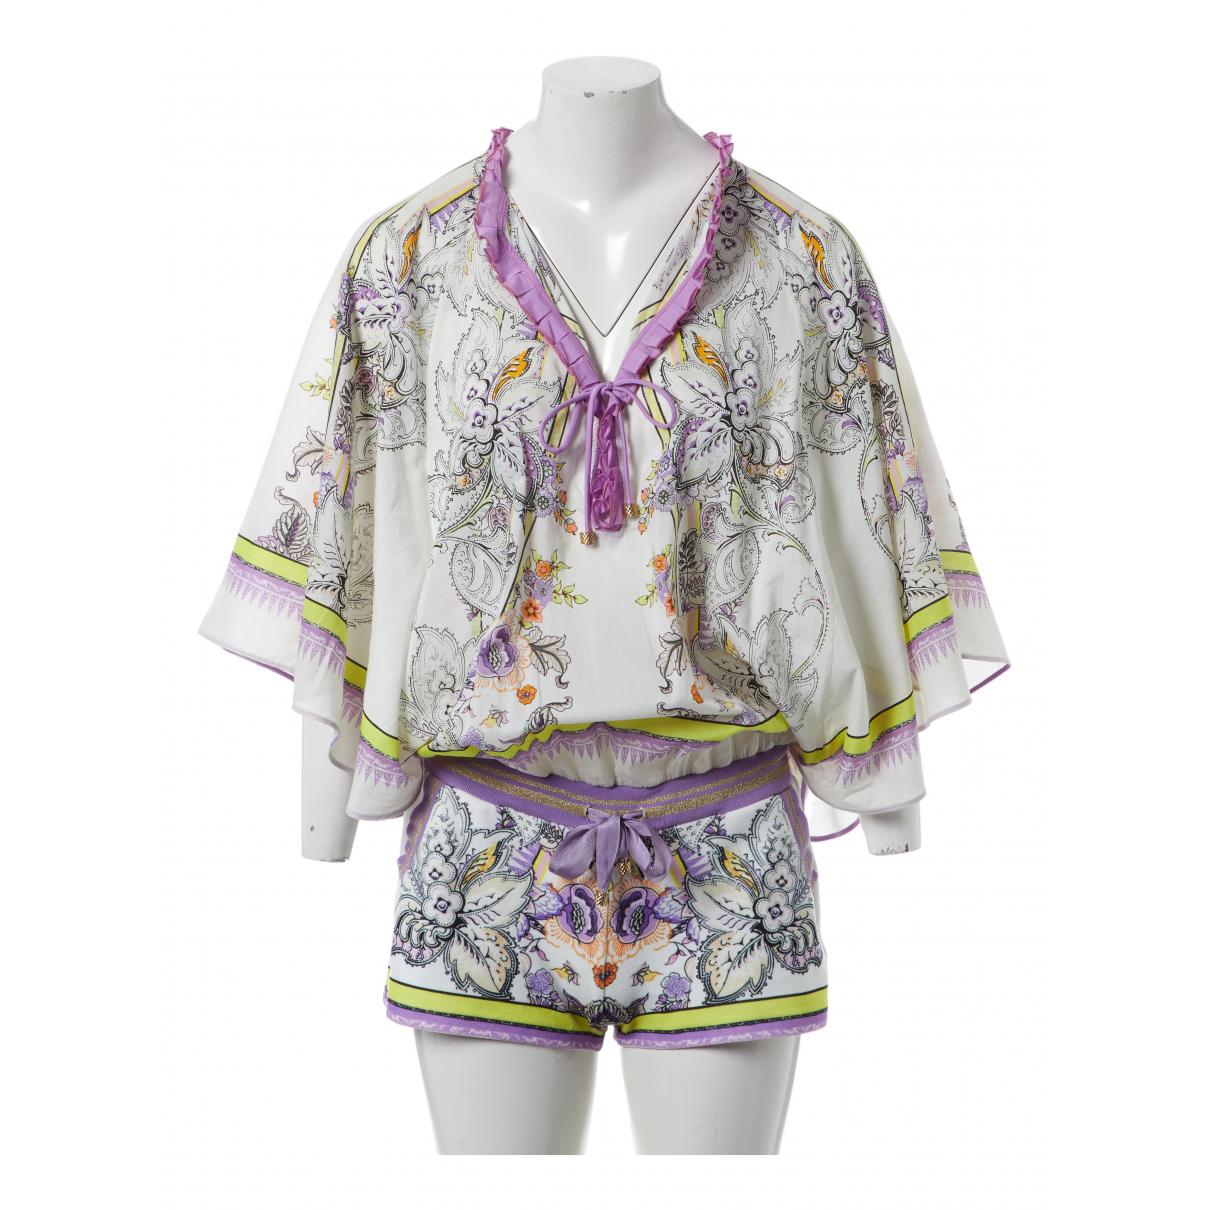 Roberto Cavalli \N White Cotton jumpsuit for Women S International